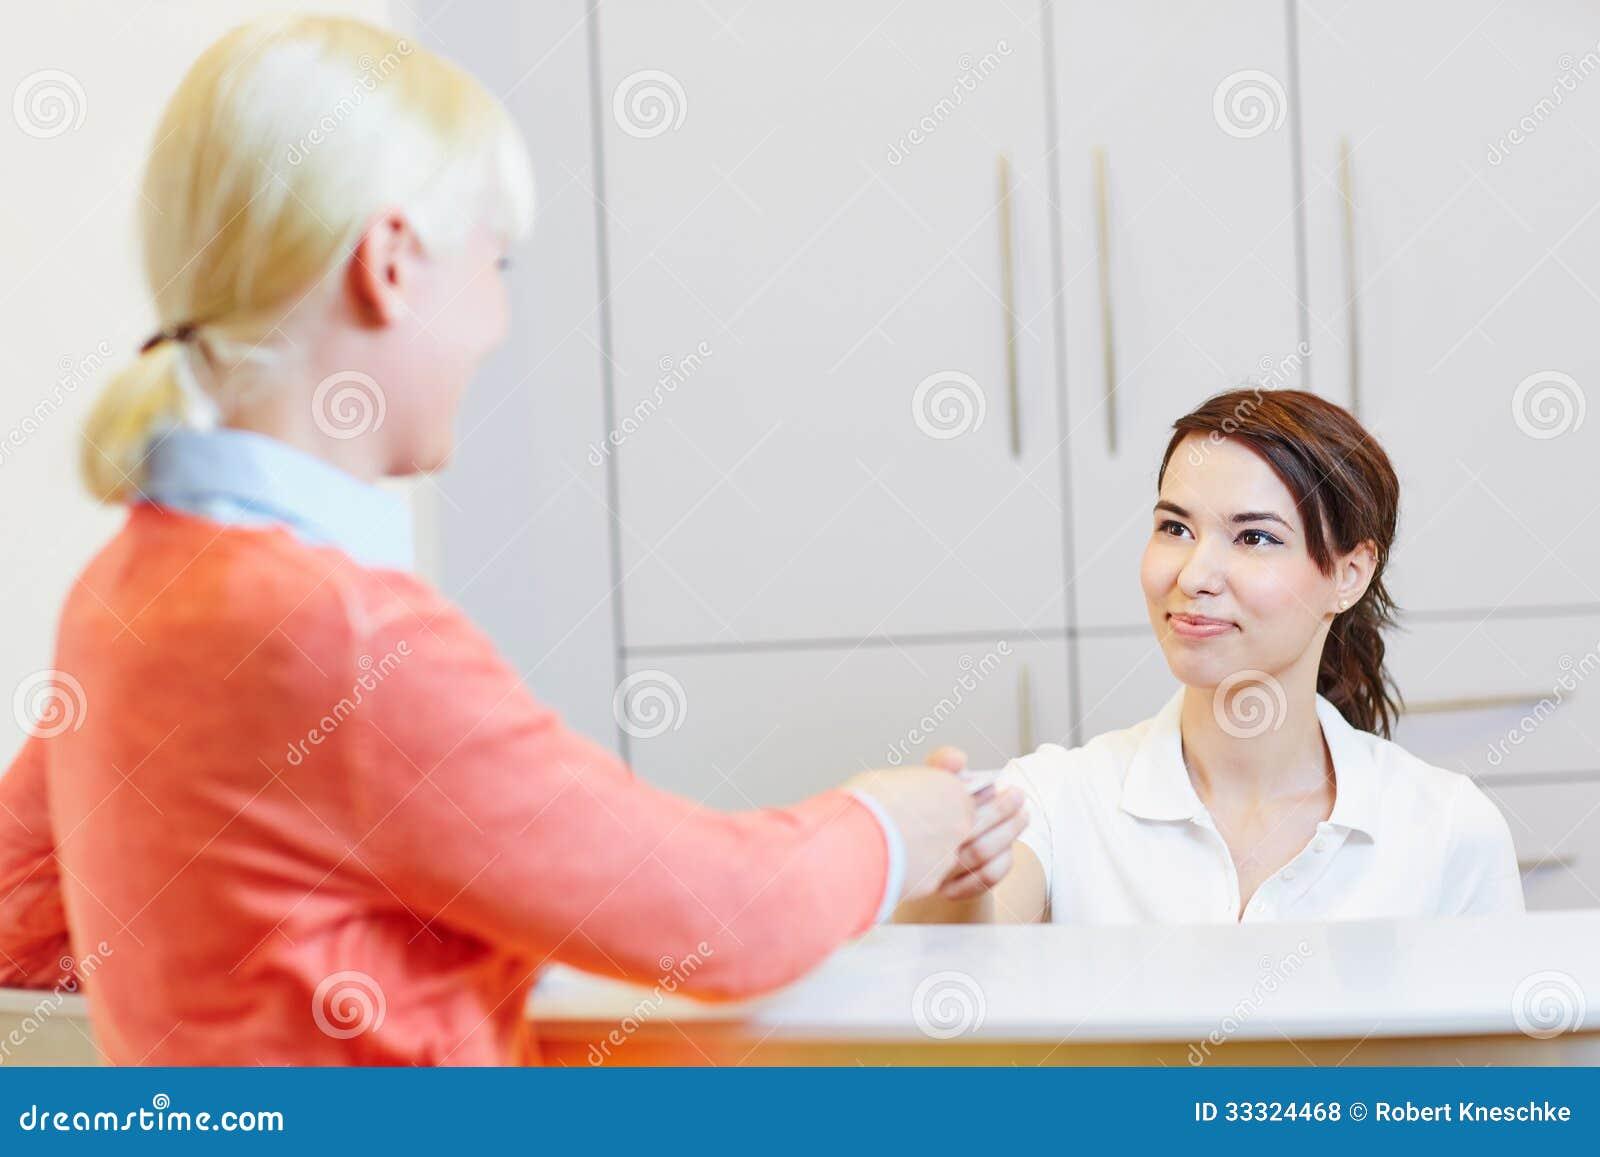 Cosmetic Dentist in Boca Raton, FL - Sindledecker Dentistry